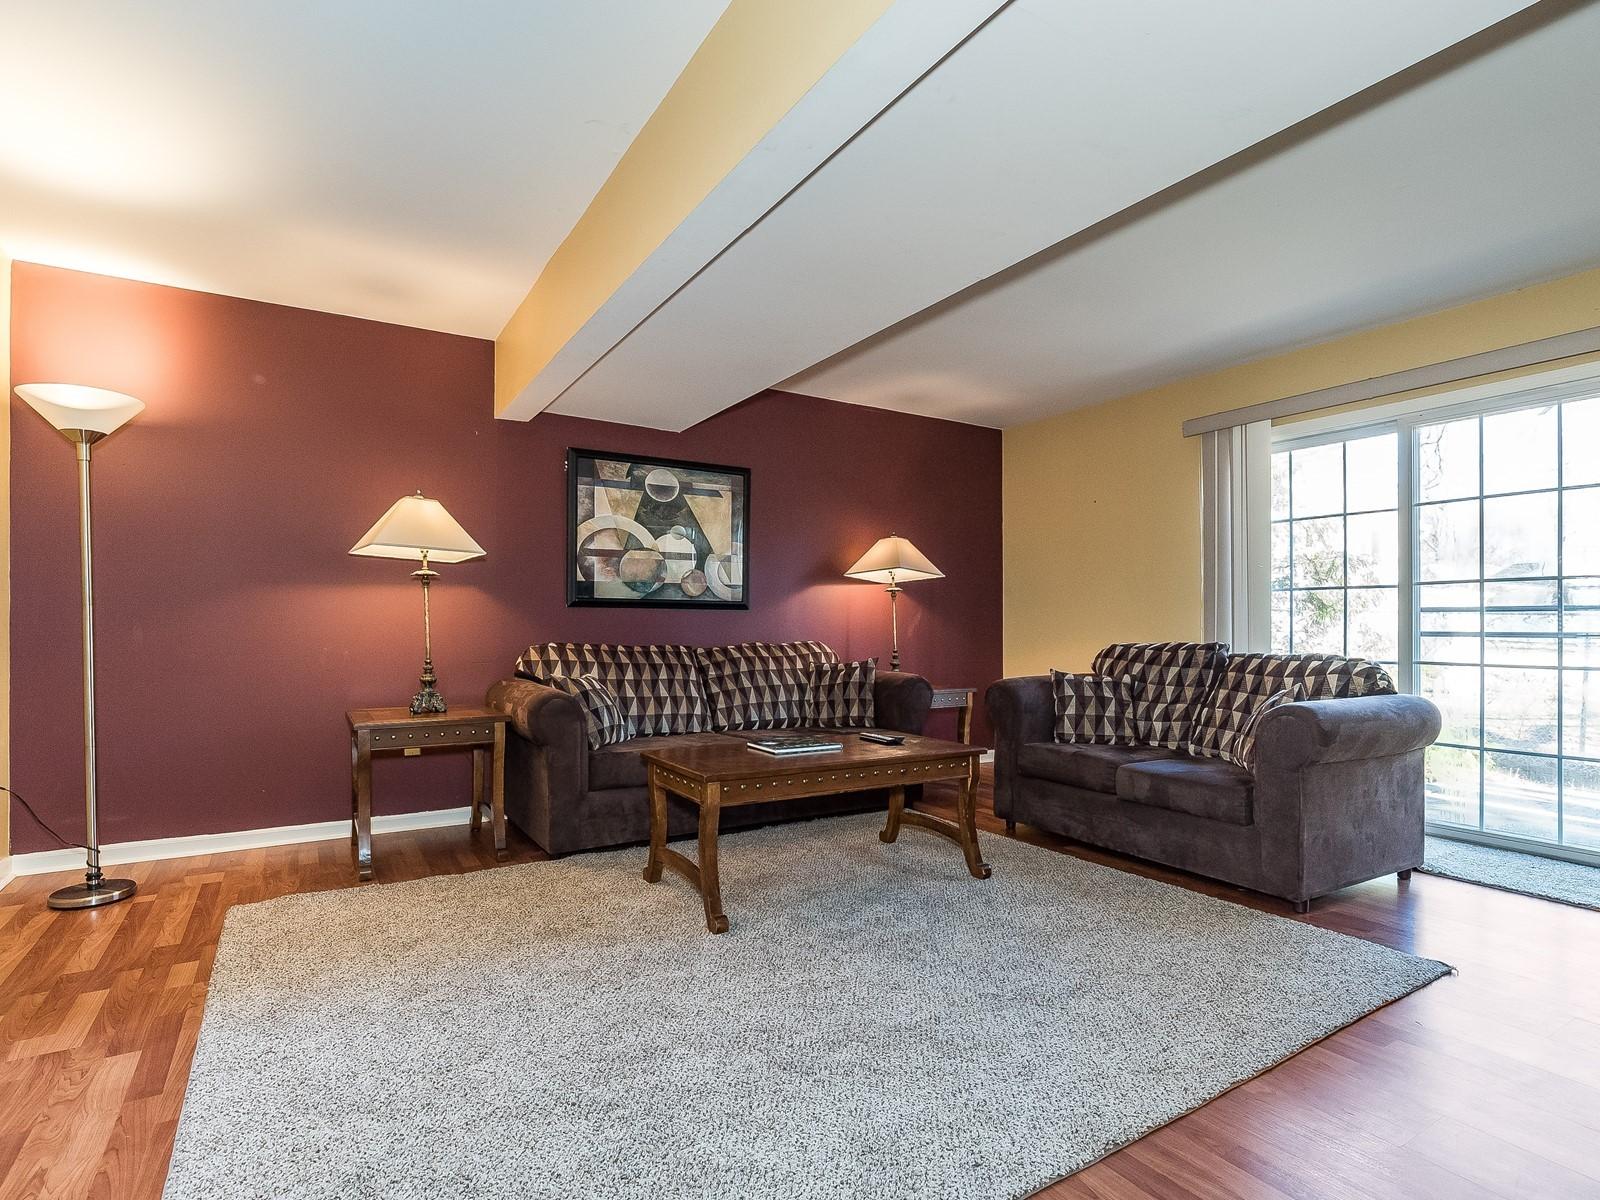 2_Furnished-House-Woodbridge_DownstairsLivingRoom